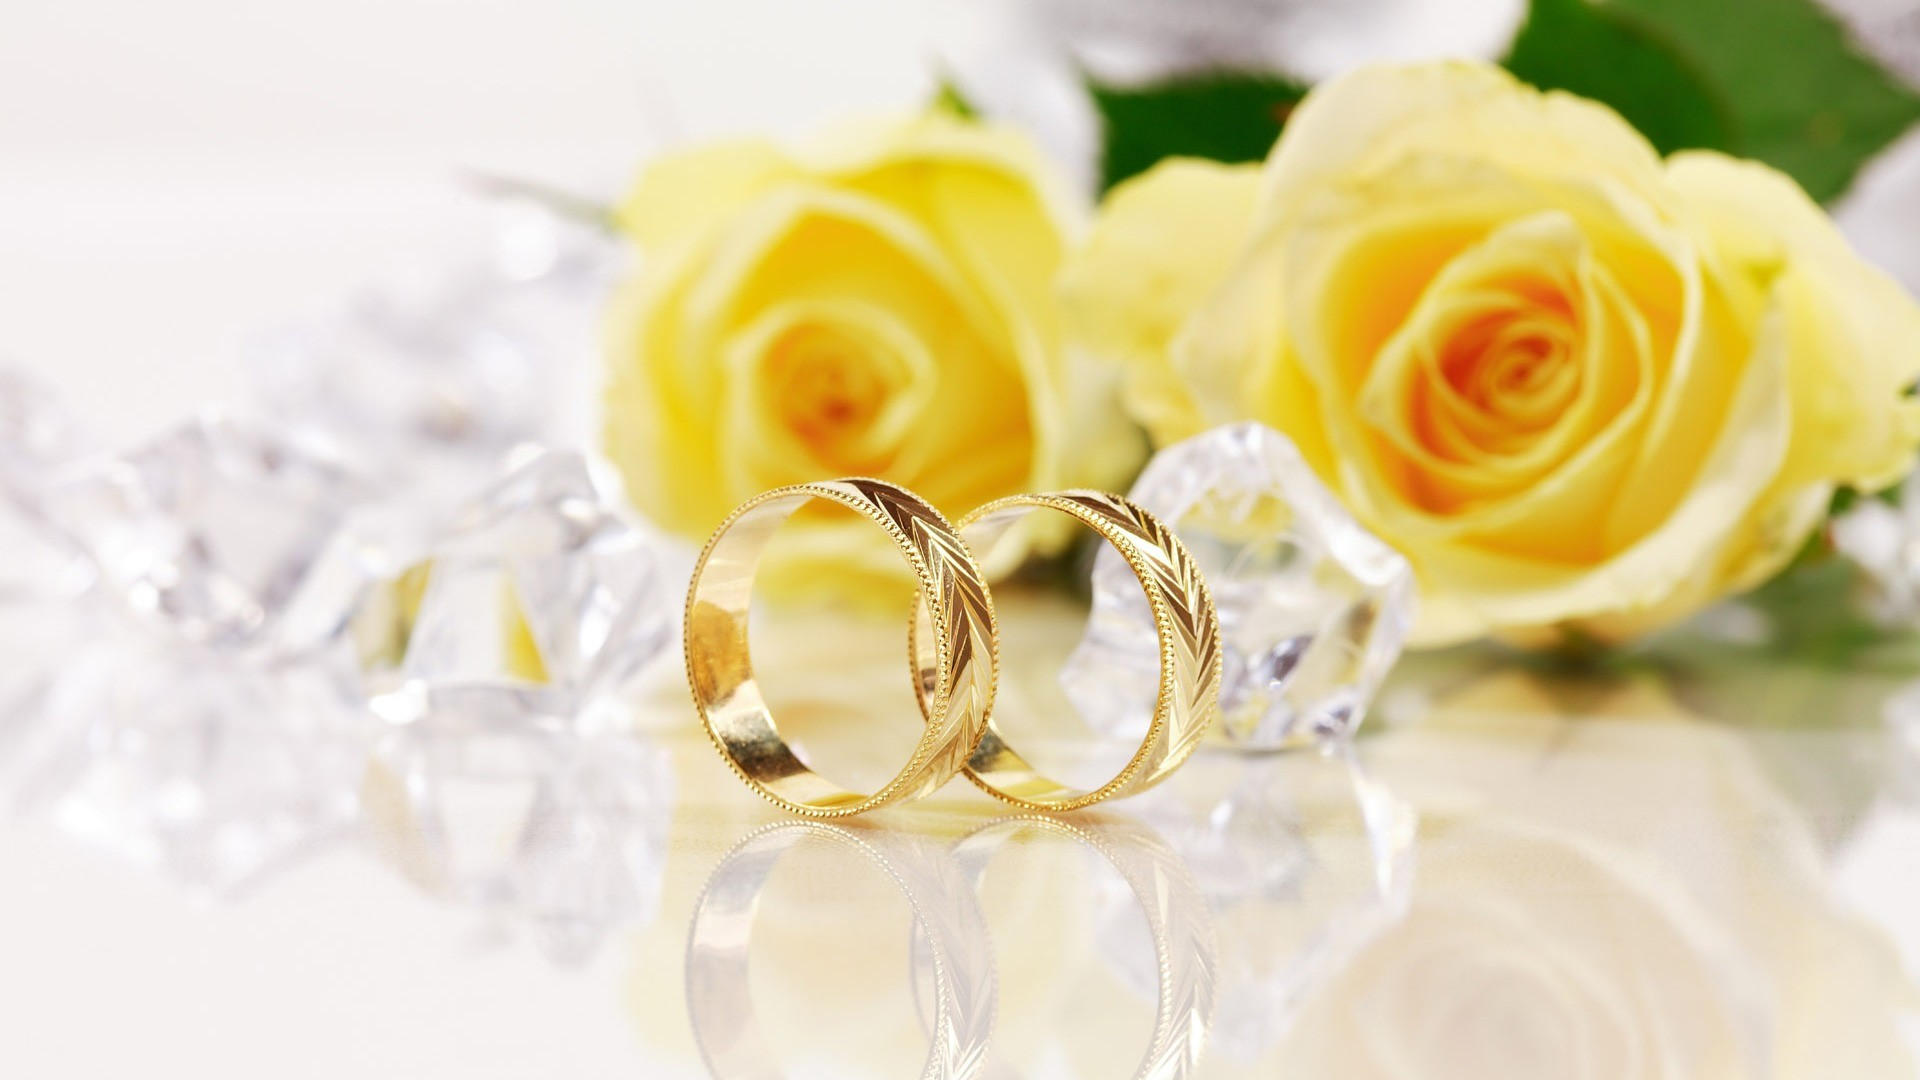 44  wedding backgrounds  u00b7 u2460 download free beautiful full hd